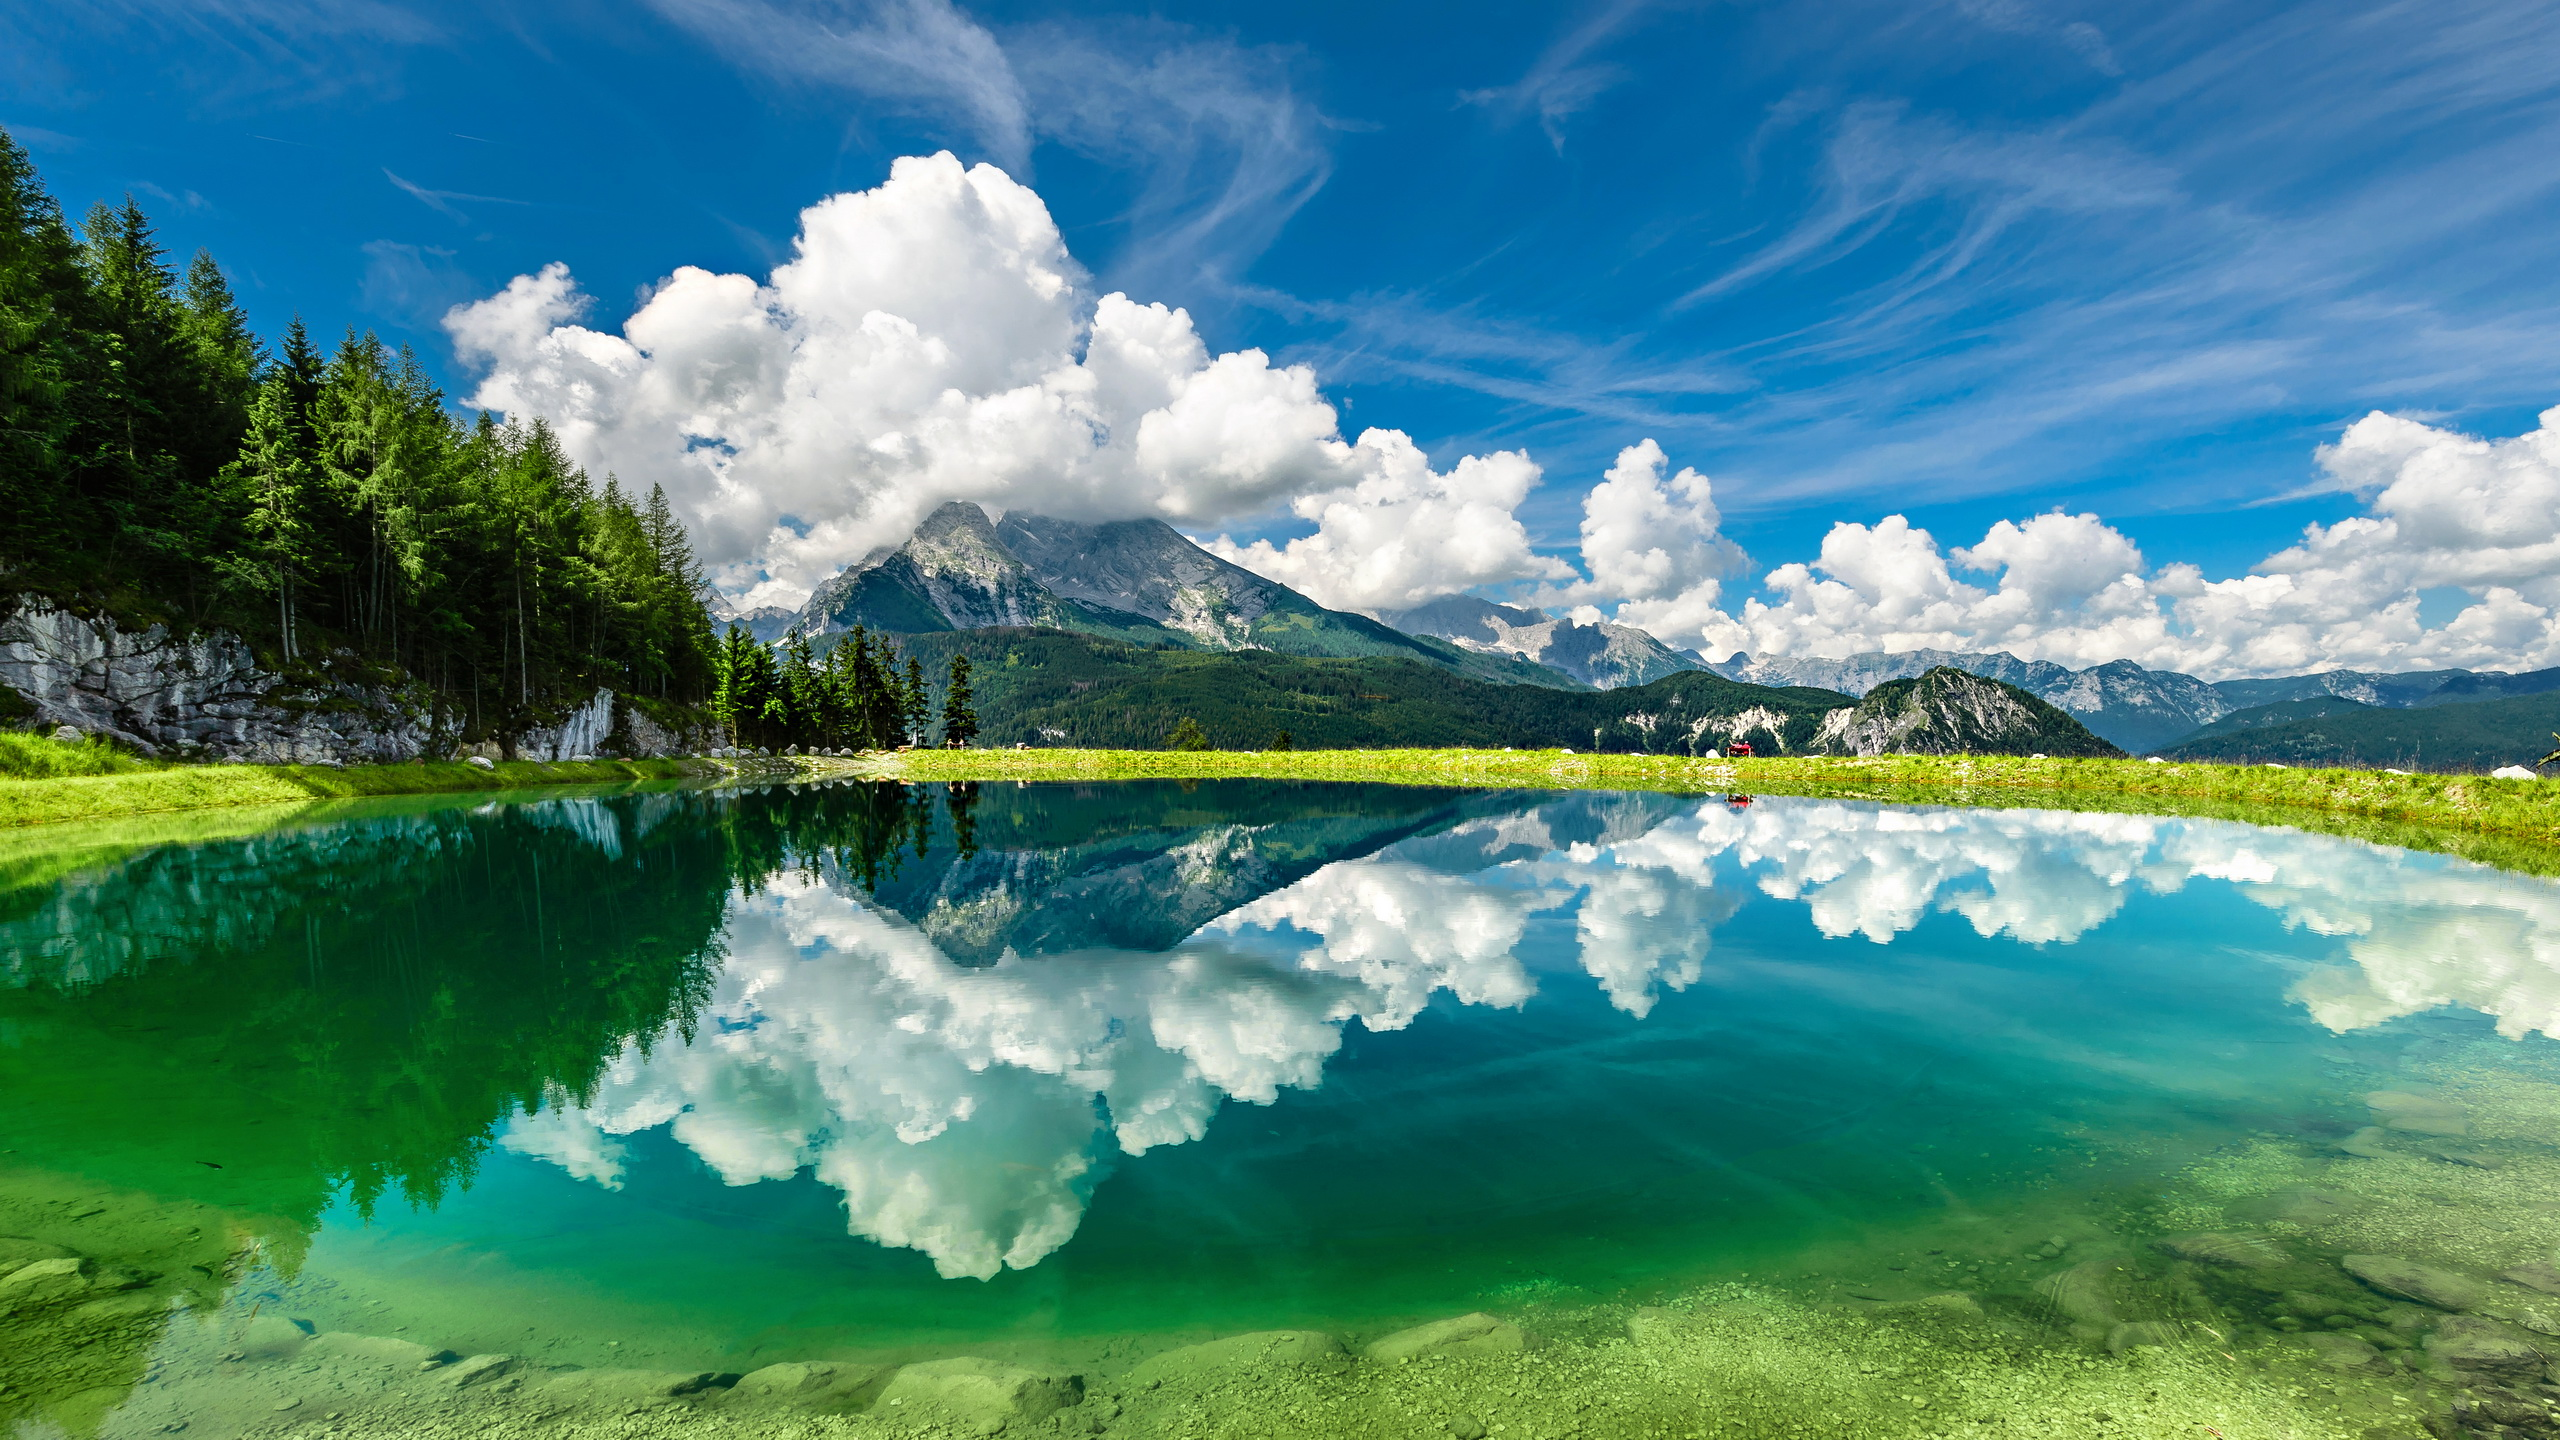 Earth Reflection 2560x1440